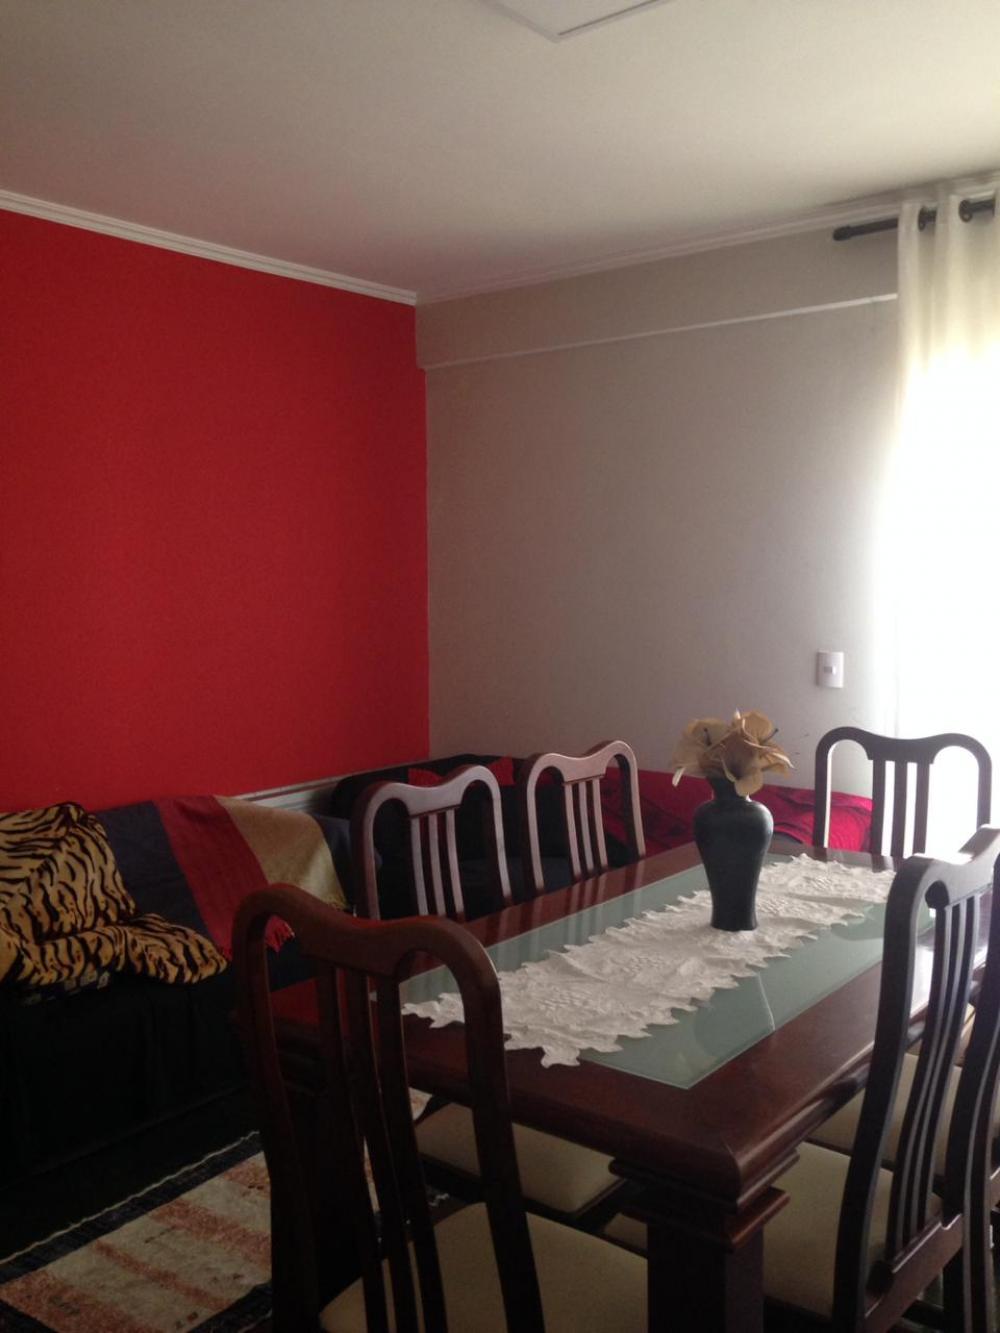 Sao Jose do Rio Preto Apartamento Venda R$260.000,00 4 Dormitorios 2 Vagas Area construida 116.00m2